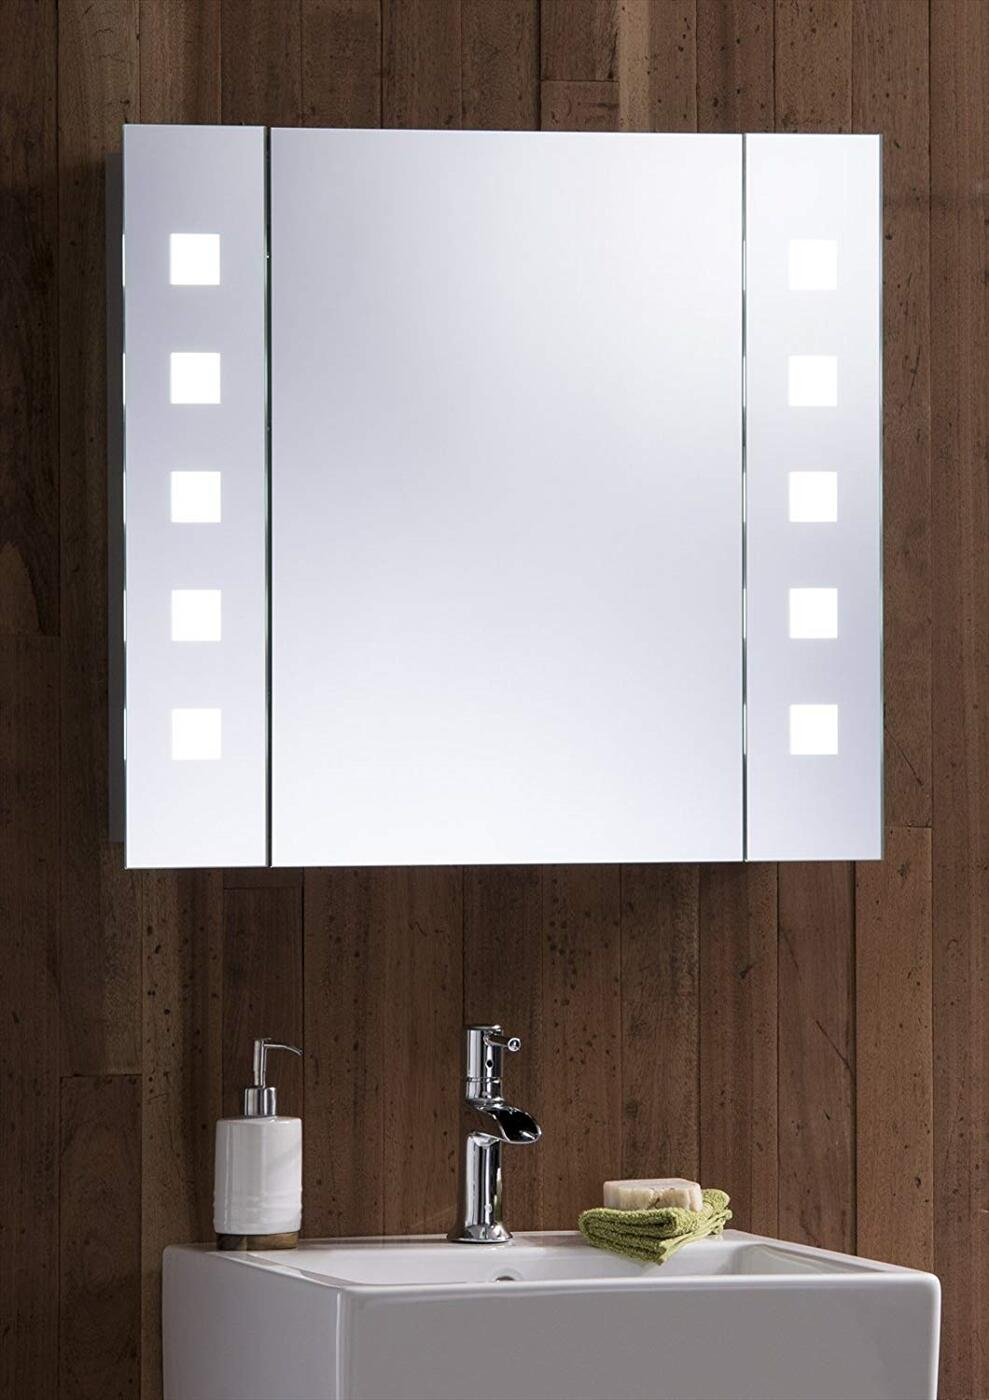 Tủ gương đèn led chữ nhật Citybuilding CBJ68LA